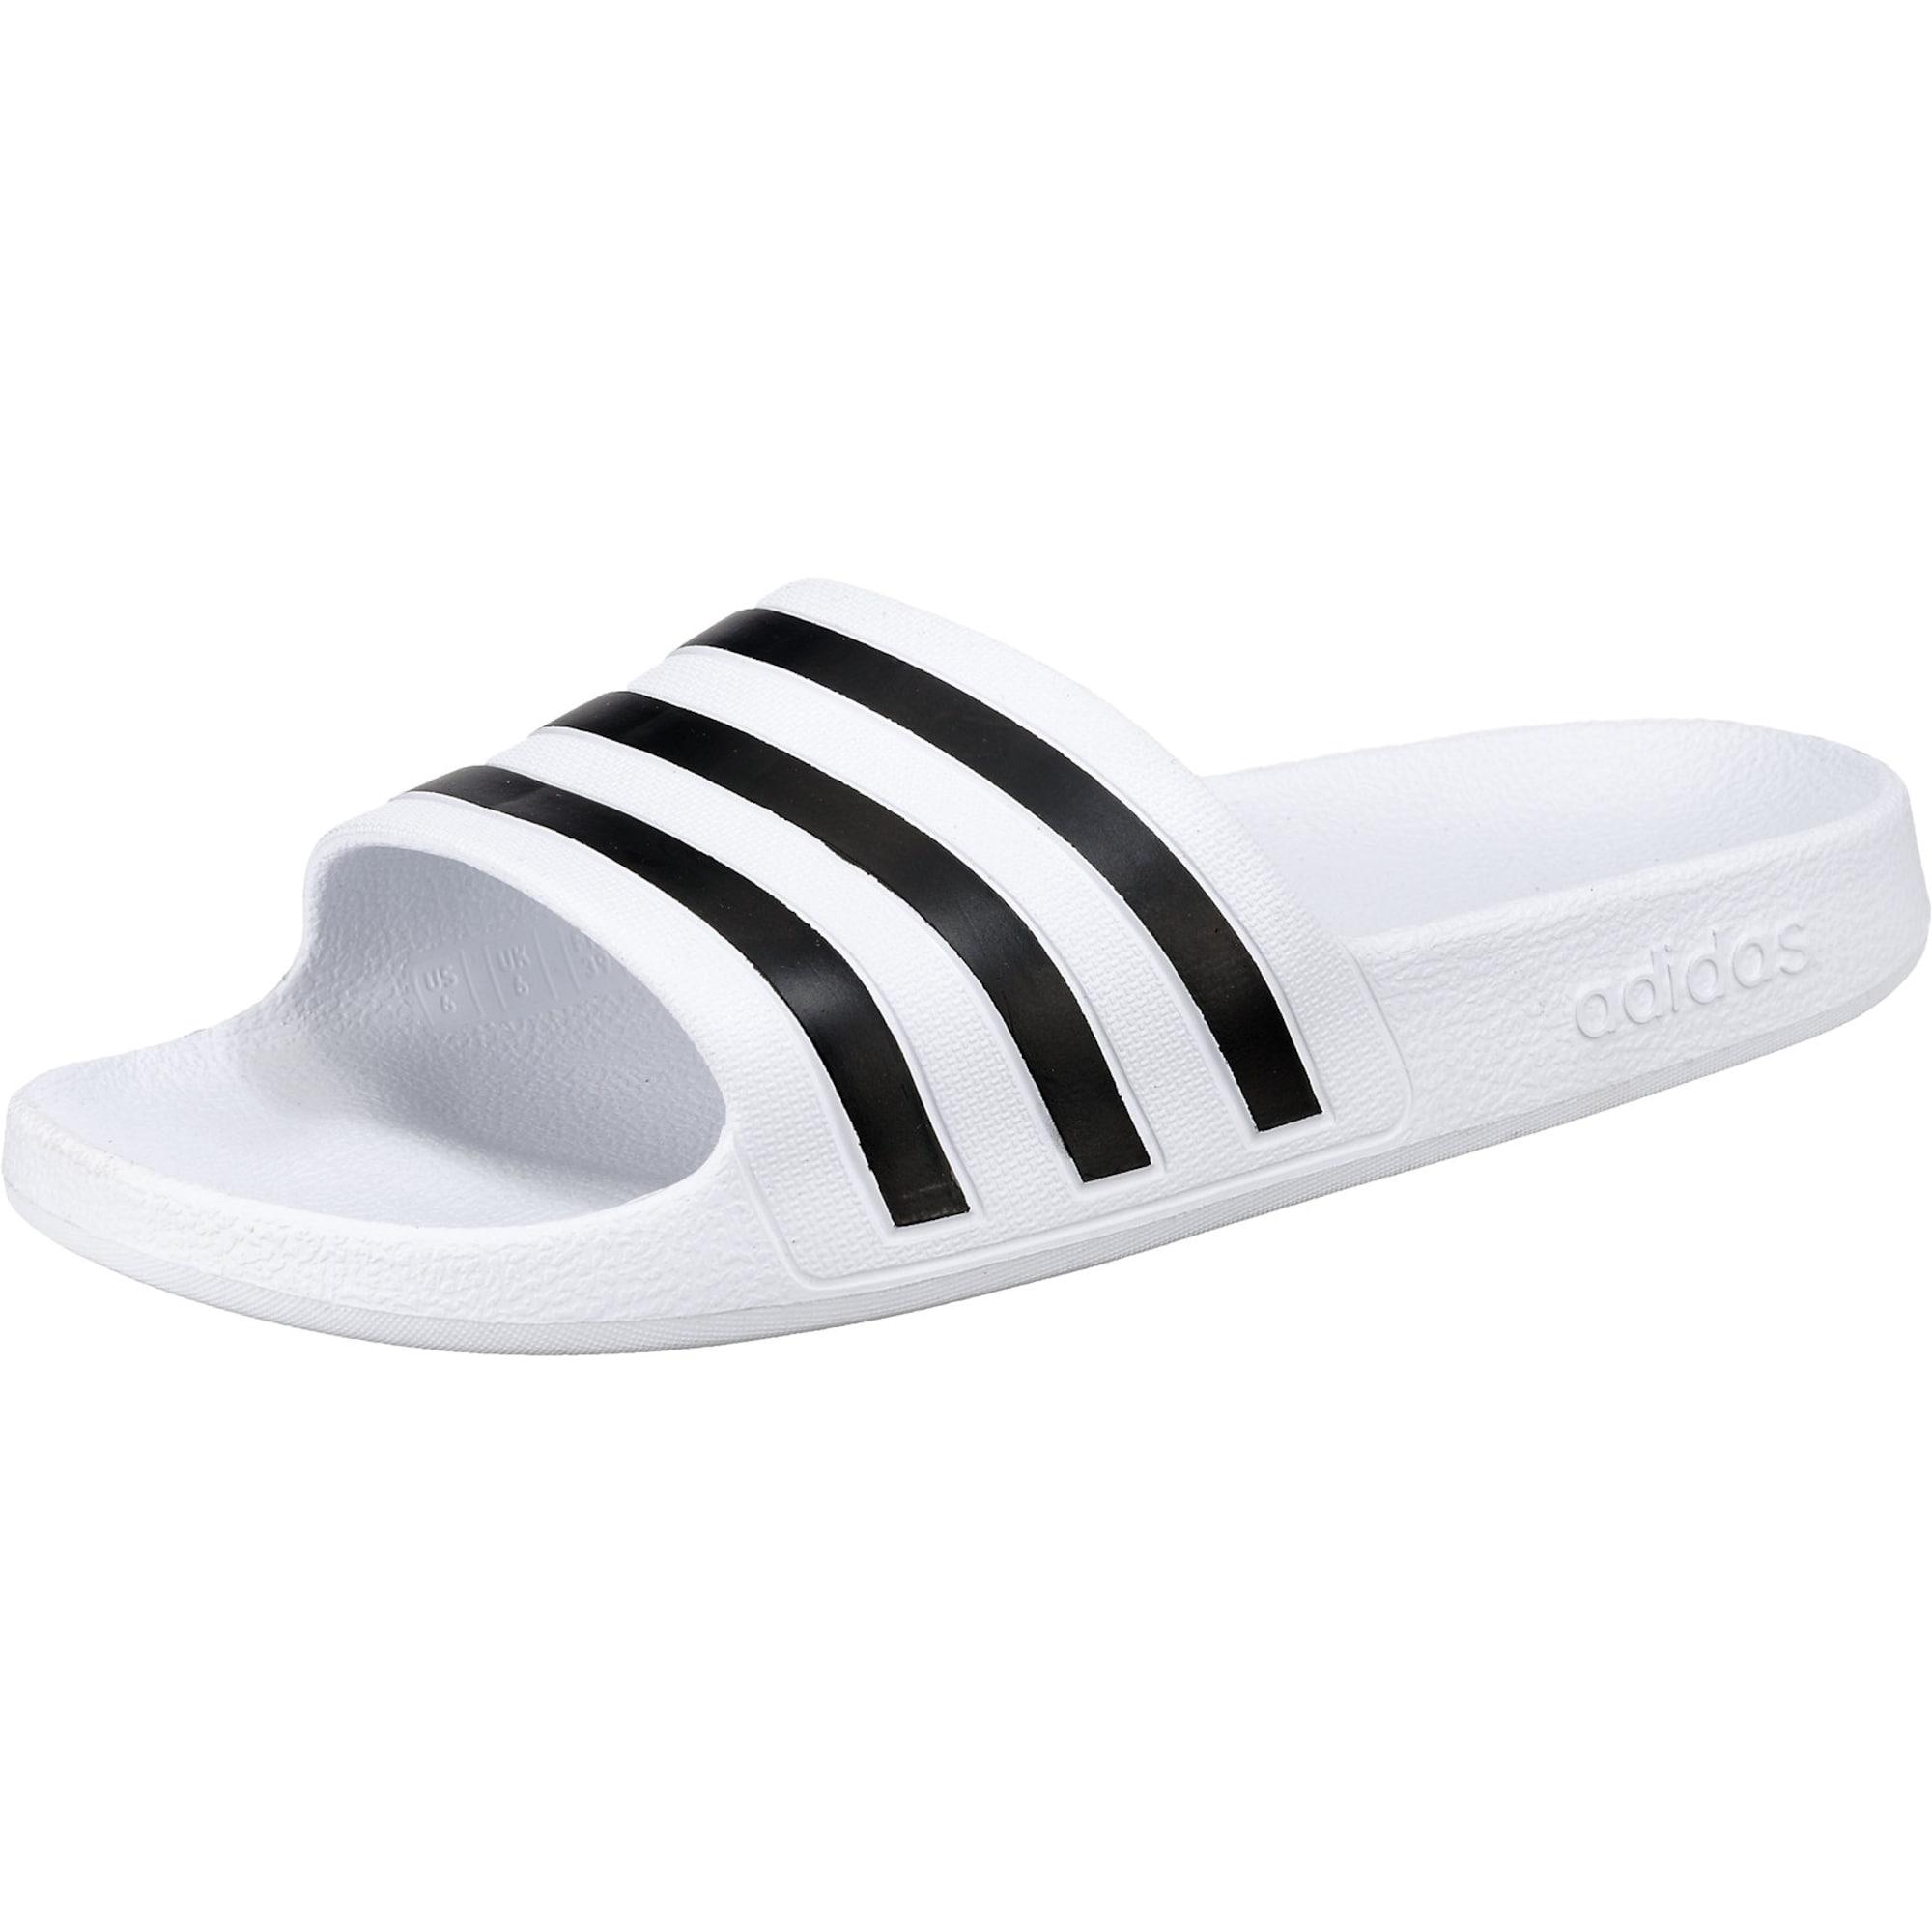 Plážovákoupací obuv Adilette Aqua černá bílá ADIDAS PERFORMANCE